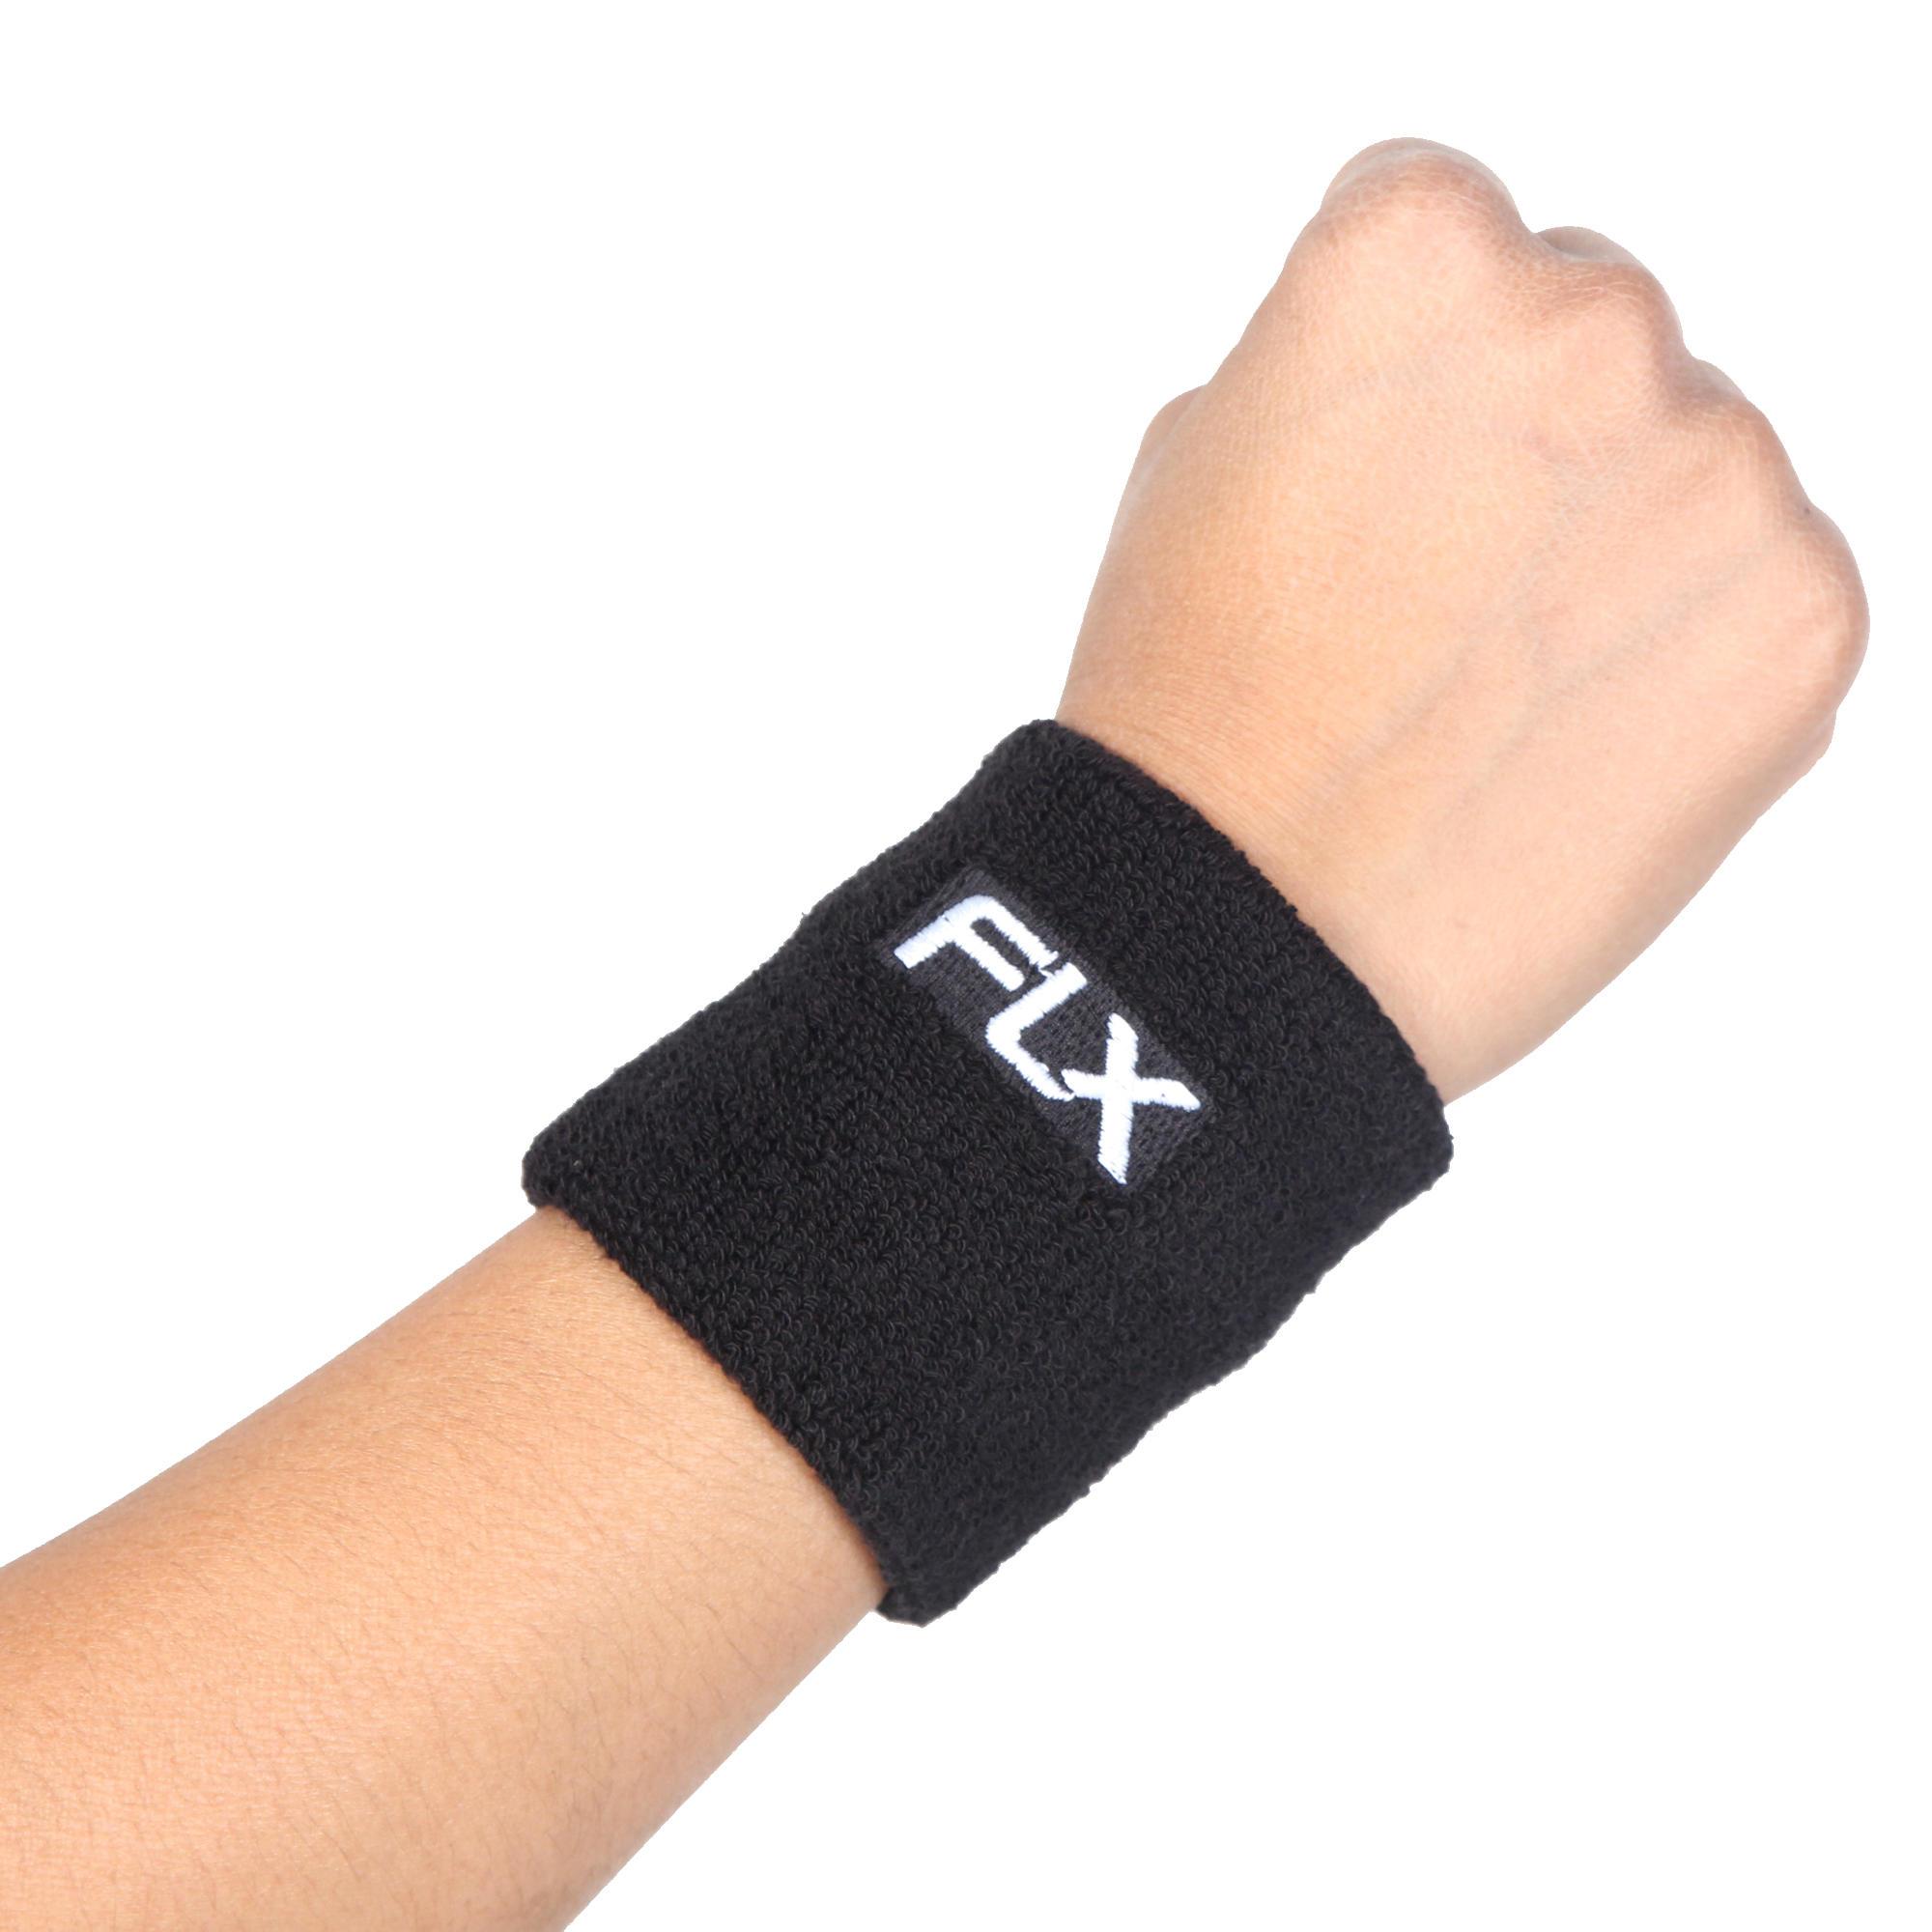 FLX Wrist Band, Super Absorbent, Black, Free Size